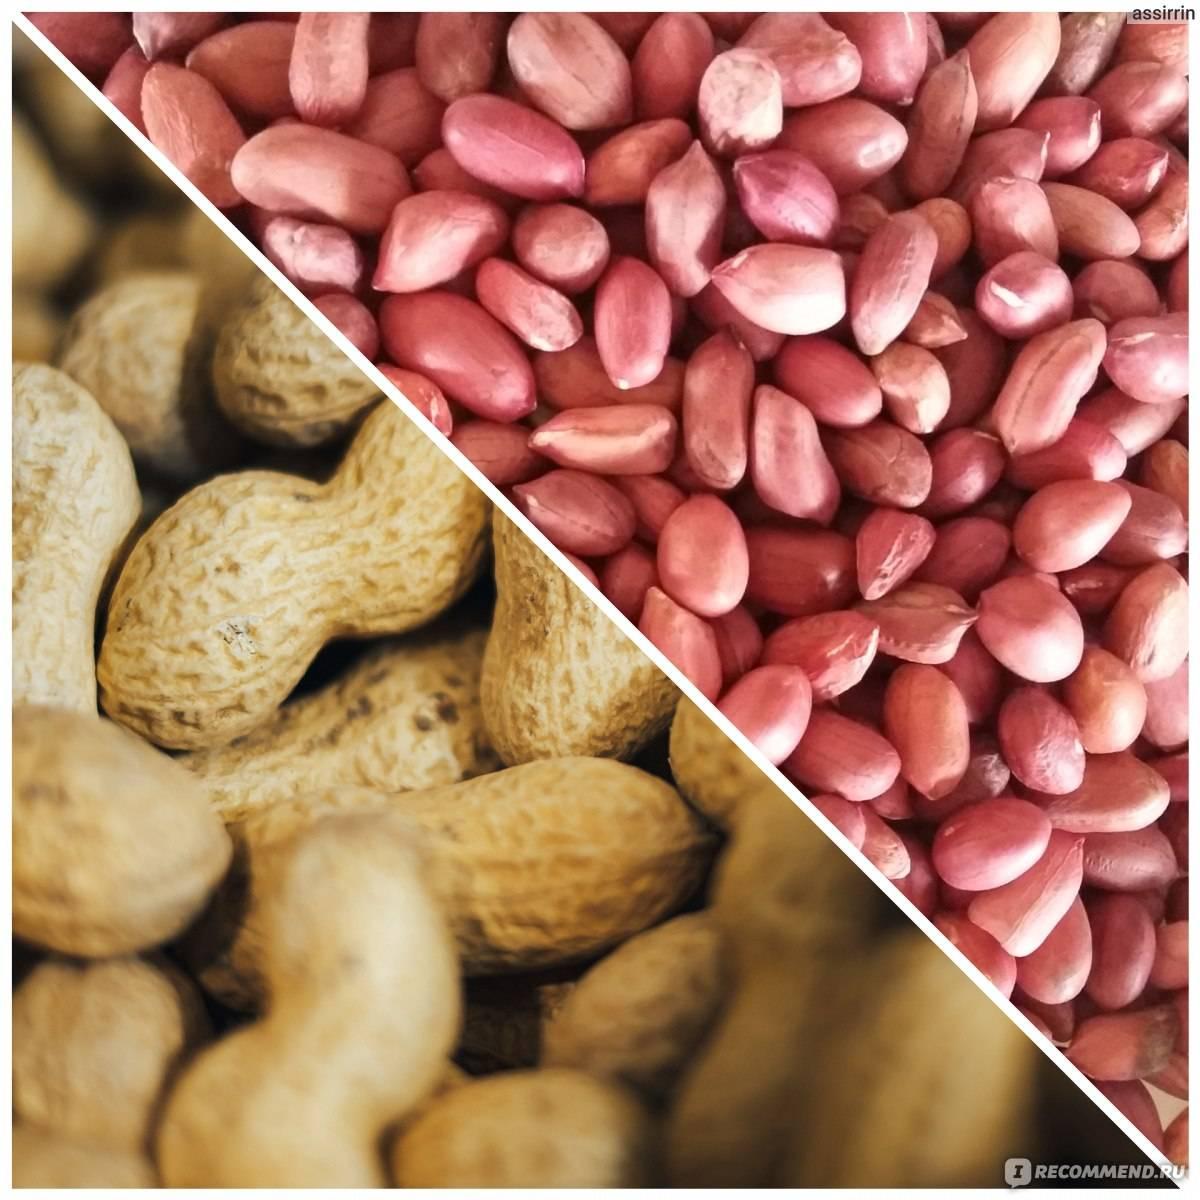 Сорта арахиса: раннер, вирджиния, валенсия | огородники